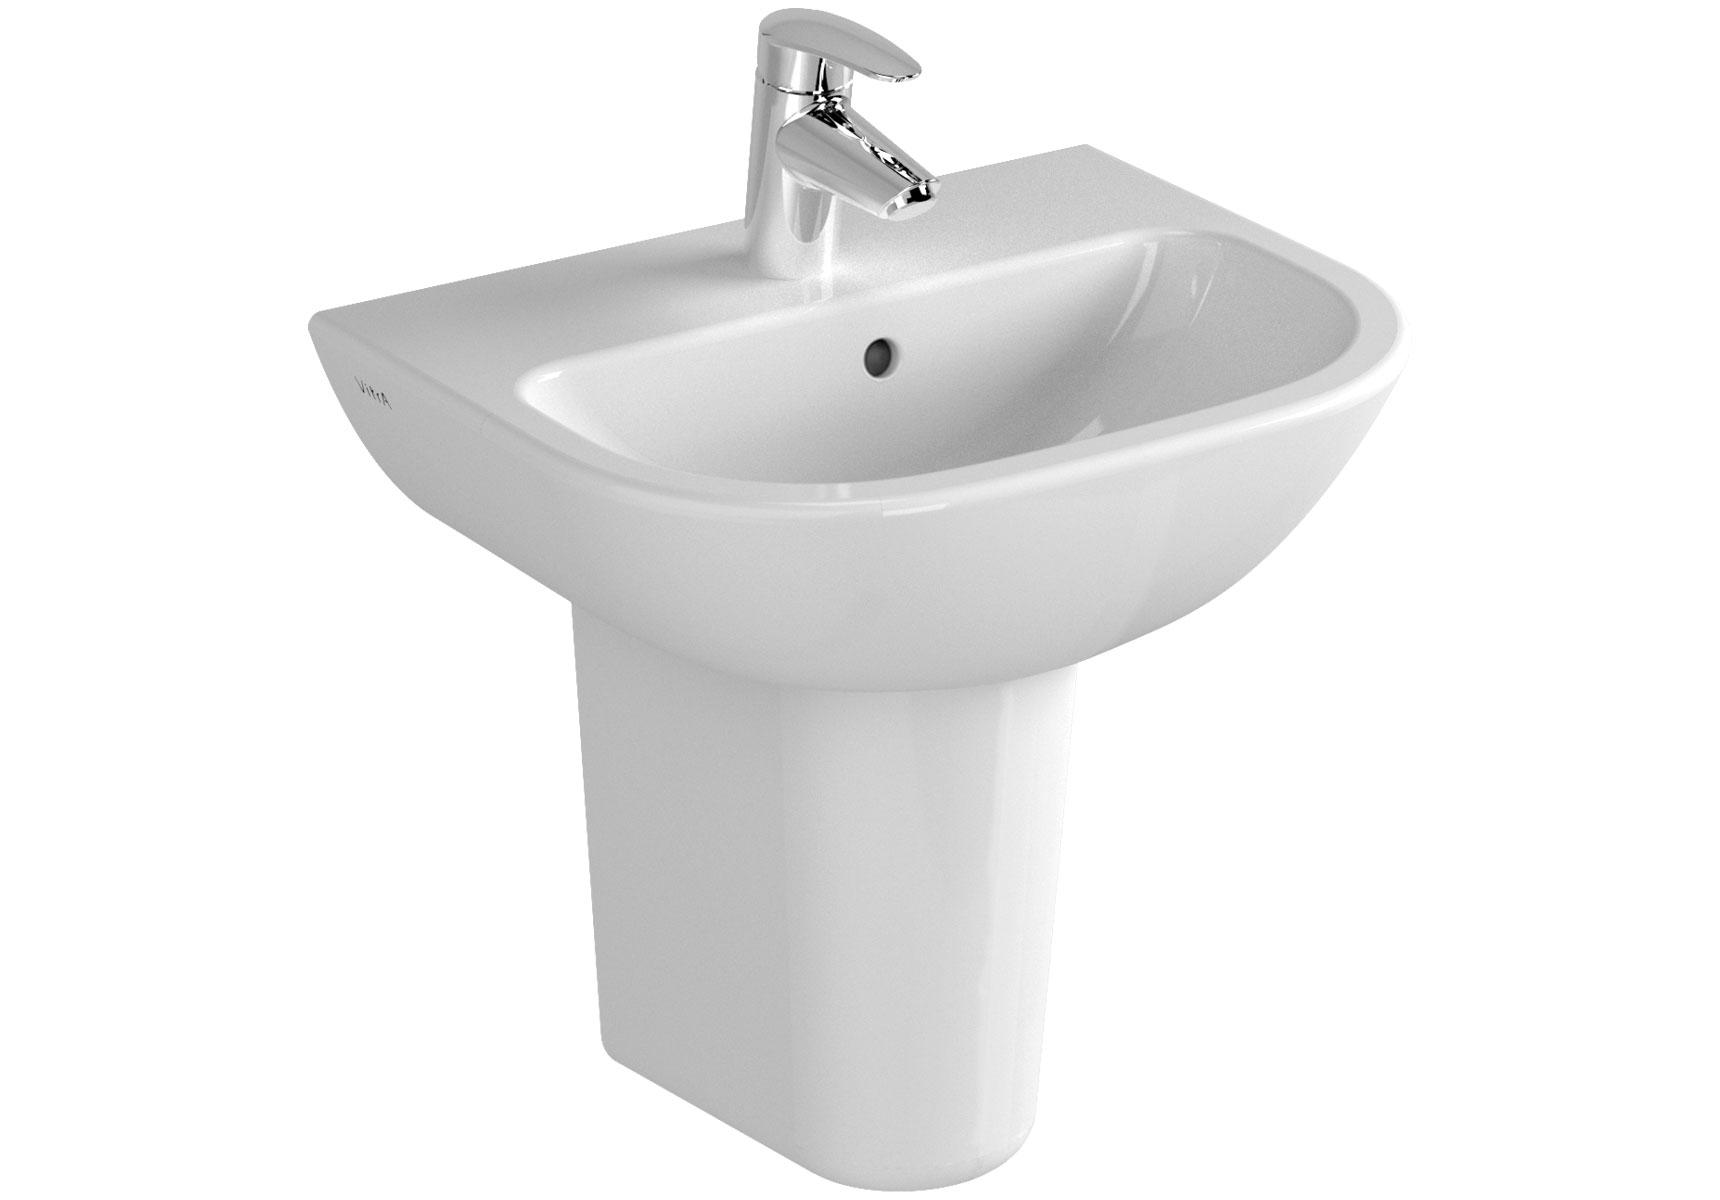 S20 Handwaschbecken, 45 cm